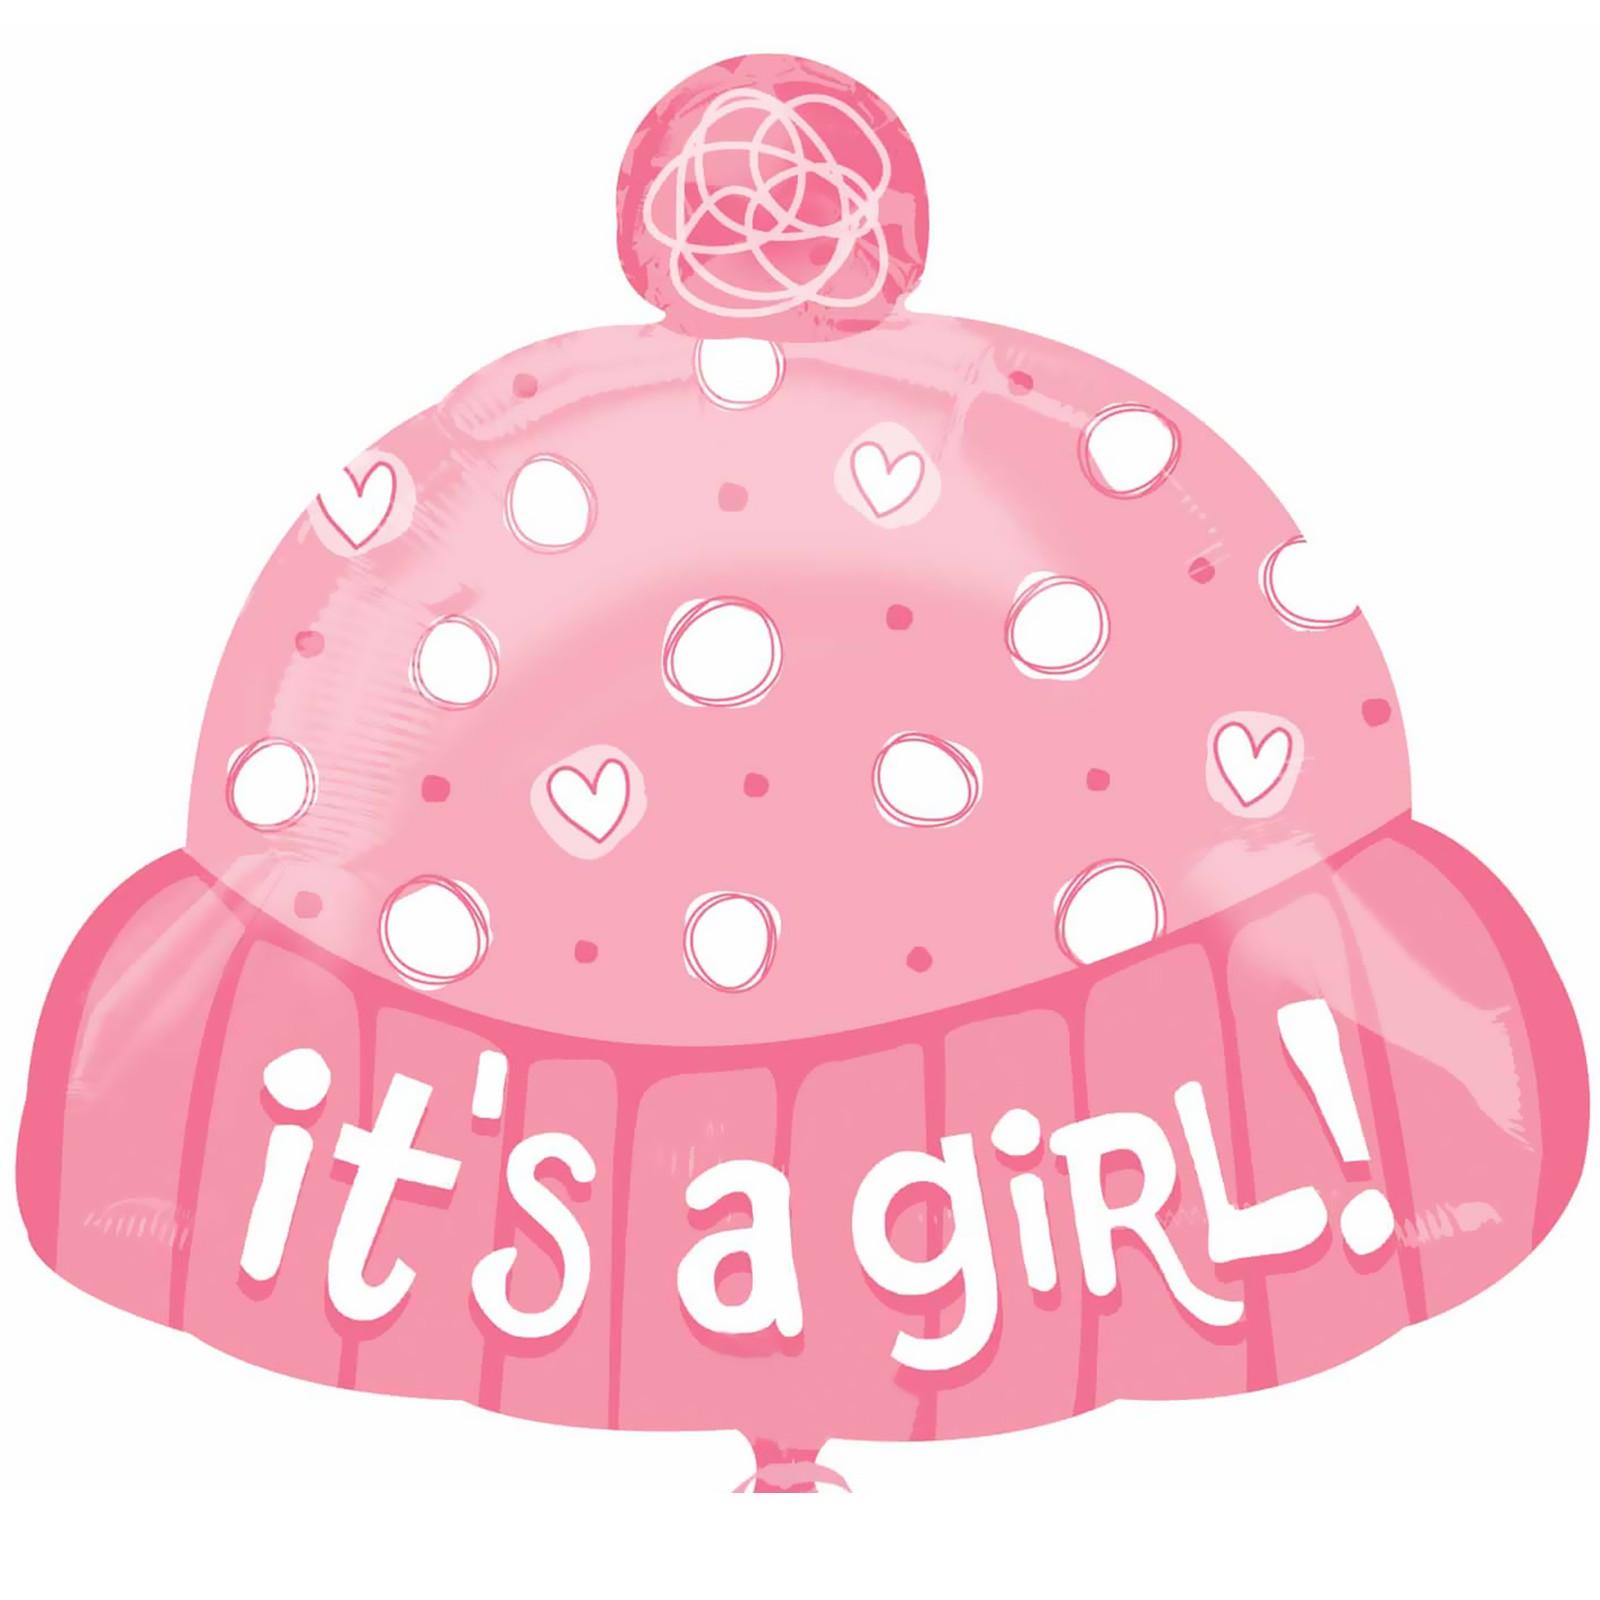 Baby bonnet head clipart clip royalty free Free Baby Hat Cliparts, Download Free Clip Art, Free Clip Art on ... clip royalty free